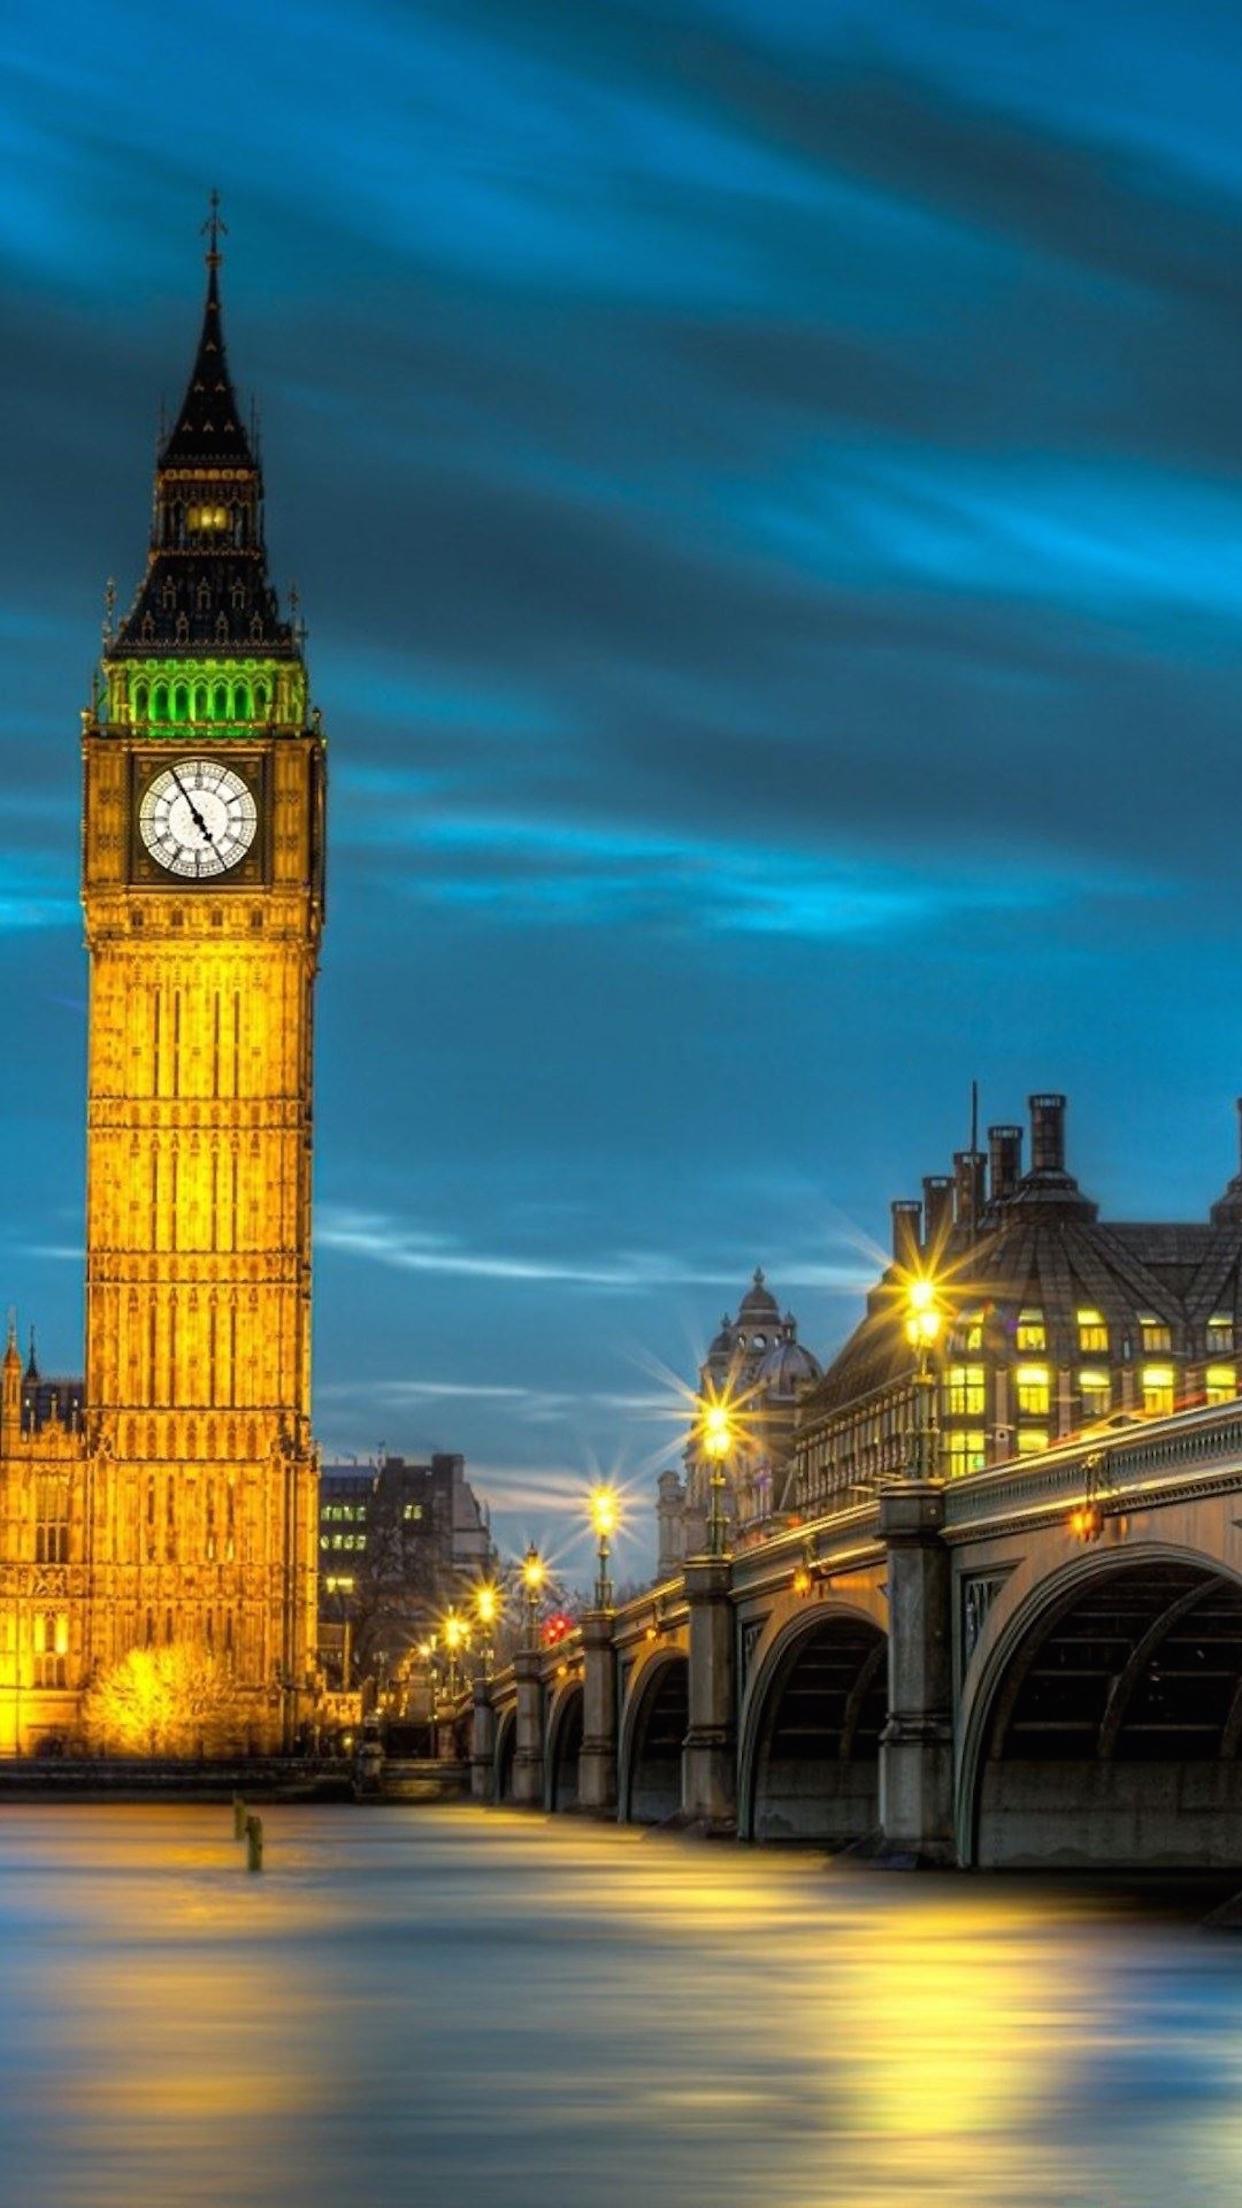 London Big Ben Wallpaper For Iphone X 8 7 6 Free